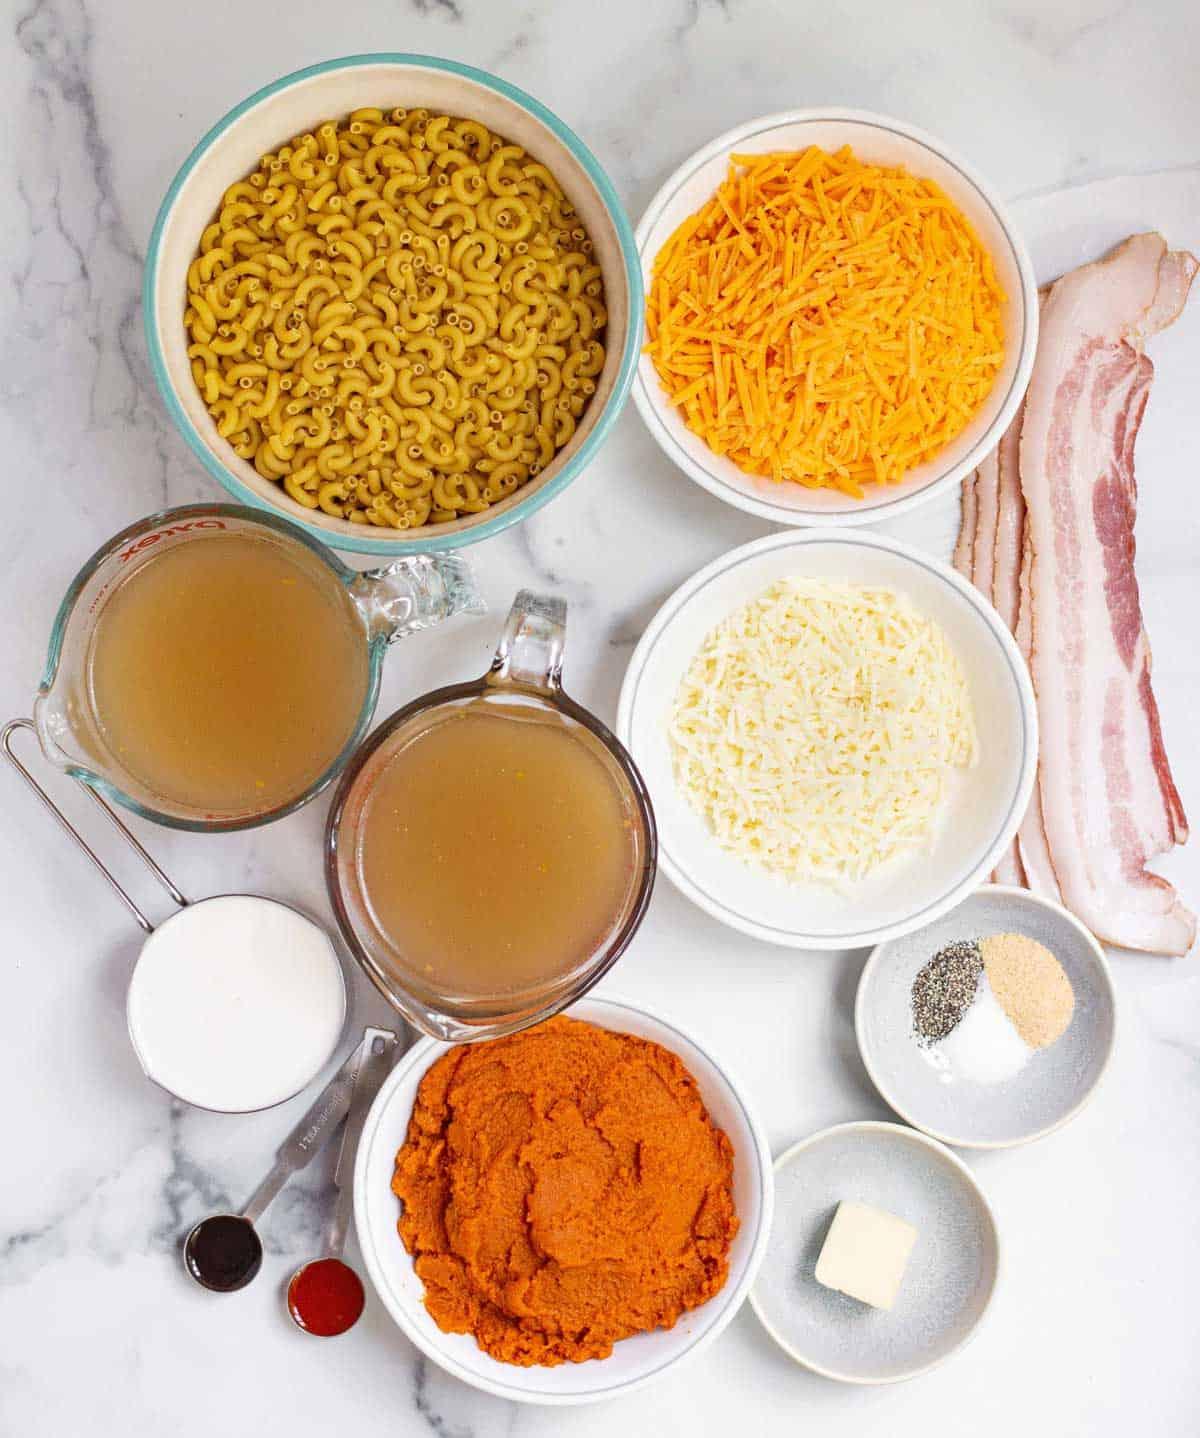 Ingredients: bacon, macaroni, chicken broth, butter, hot sauce, Worcestershire sauce, garlic powder, salt, pepper, shredded cheddar, shredded mozzarella, half and half, pumpkin puree.